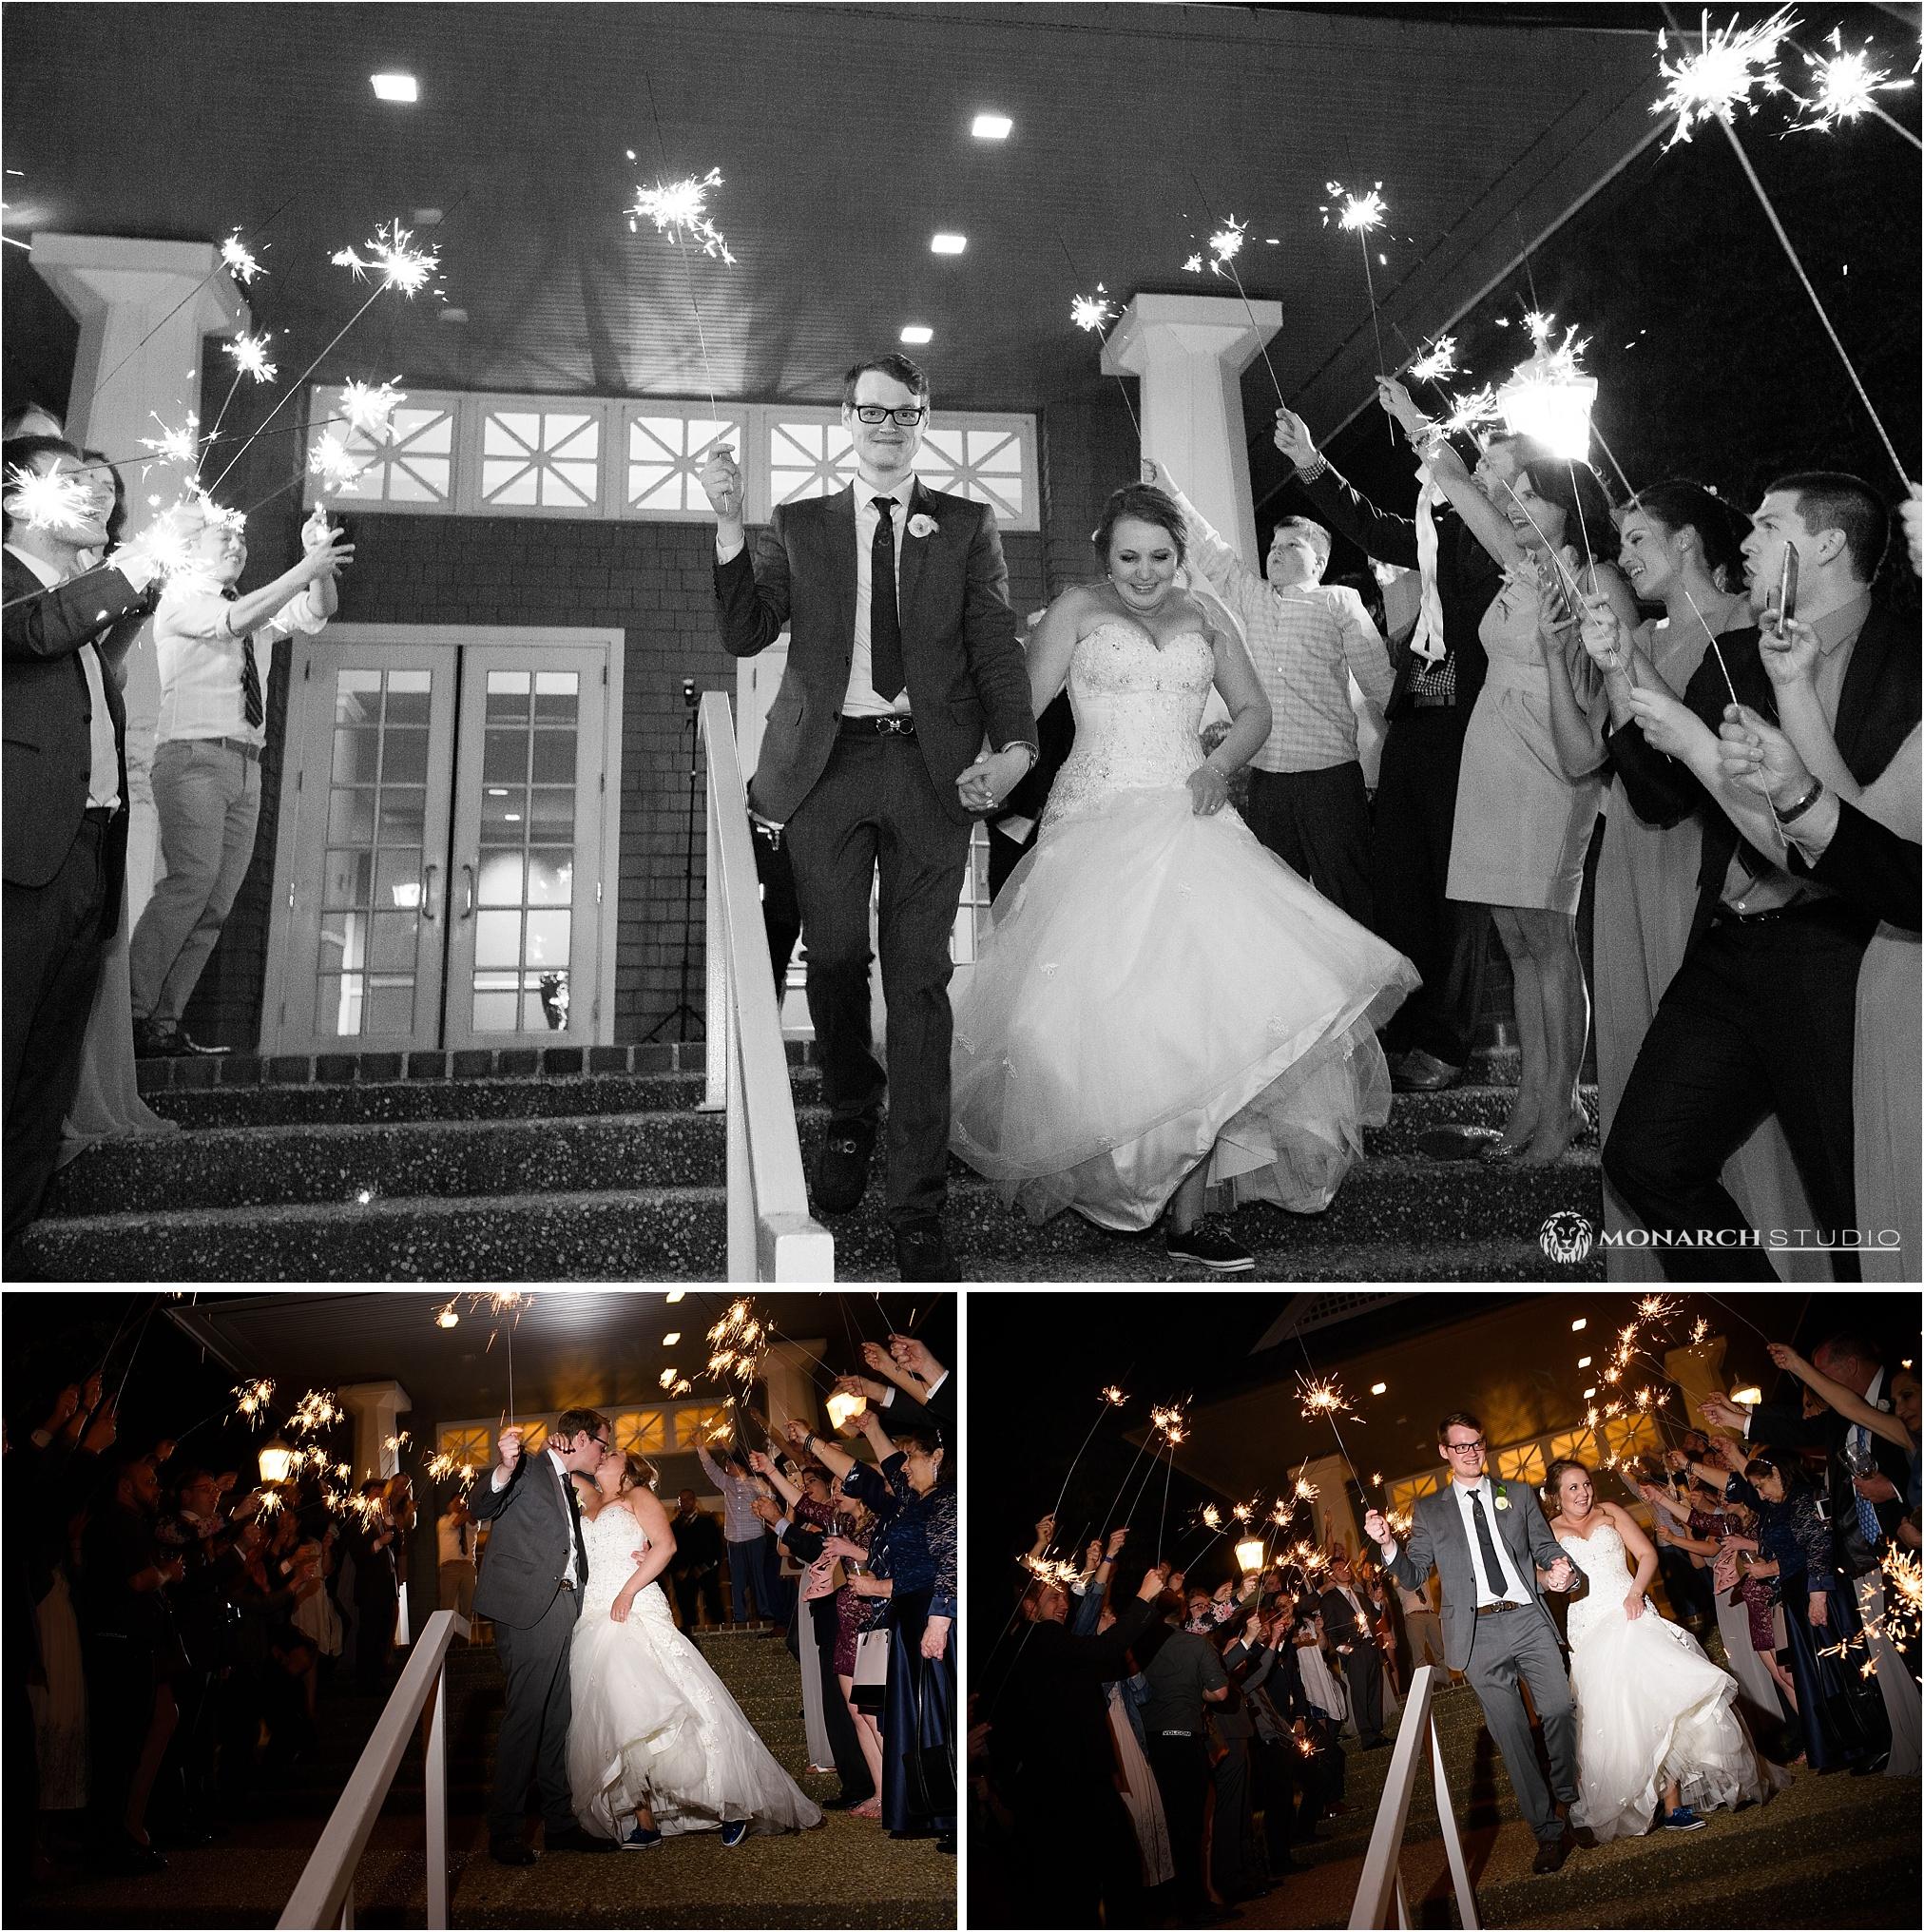 williamsburg-virginia-wedding-photographer-153.jpg